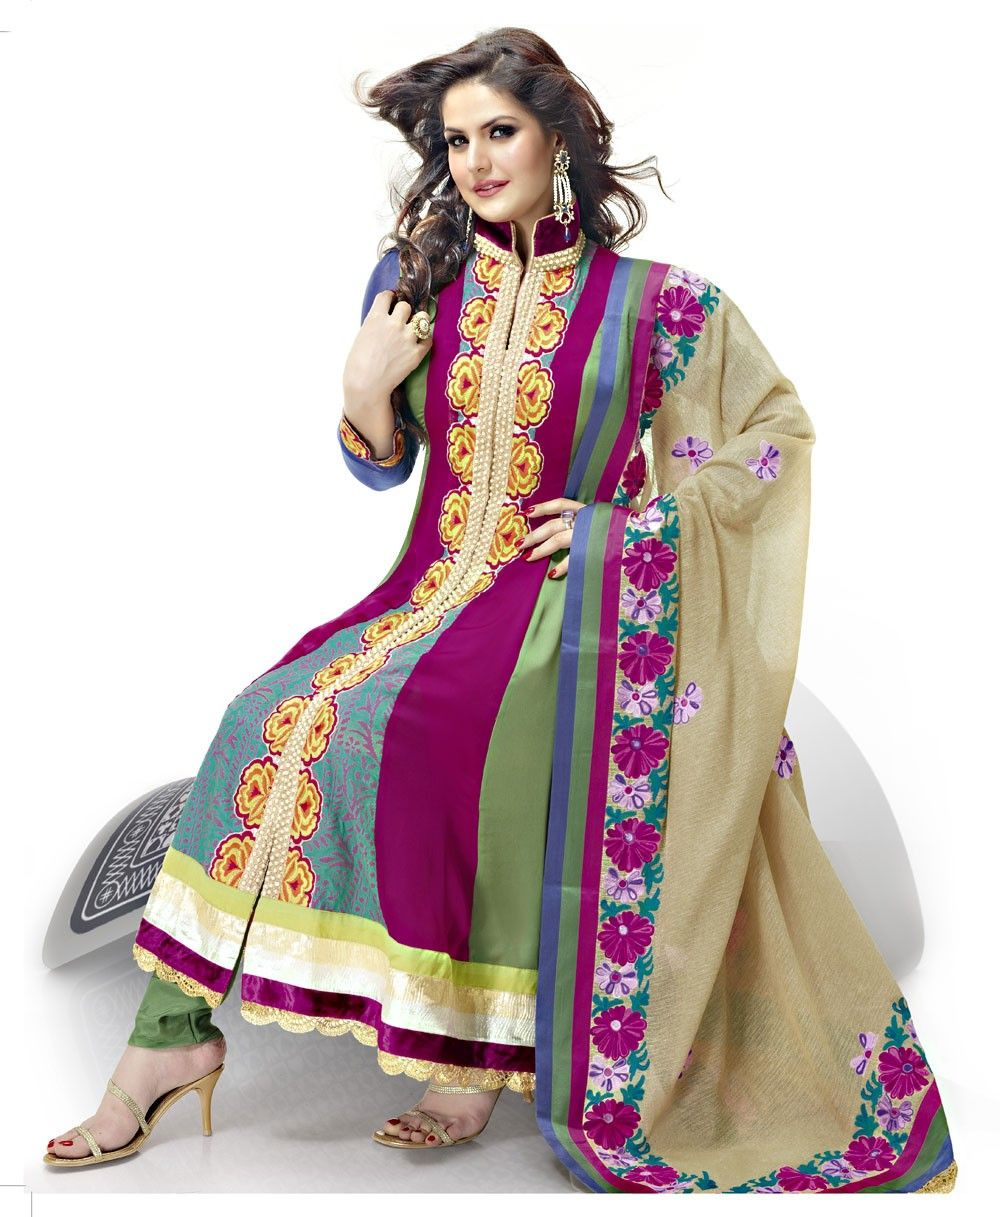 Multi Colored Satin Churidar Kameez >> http://www.gravity-fashion.com/10395-multi-colored-satin-churidar-kameez.html